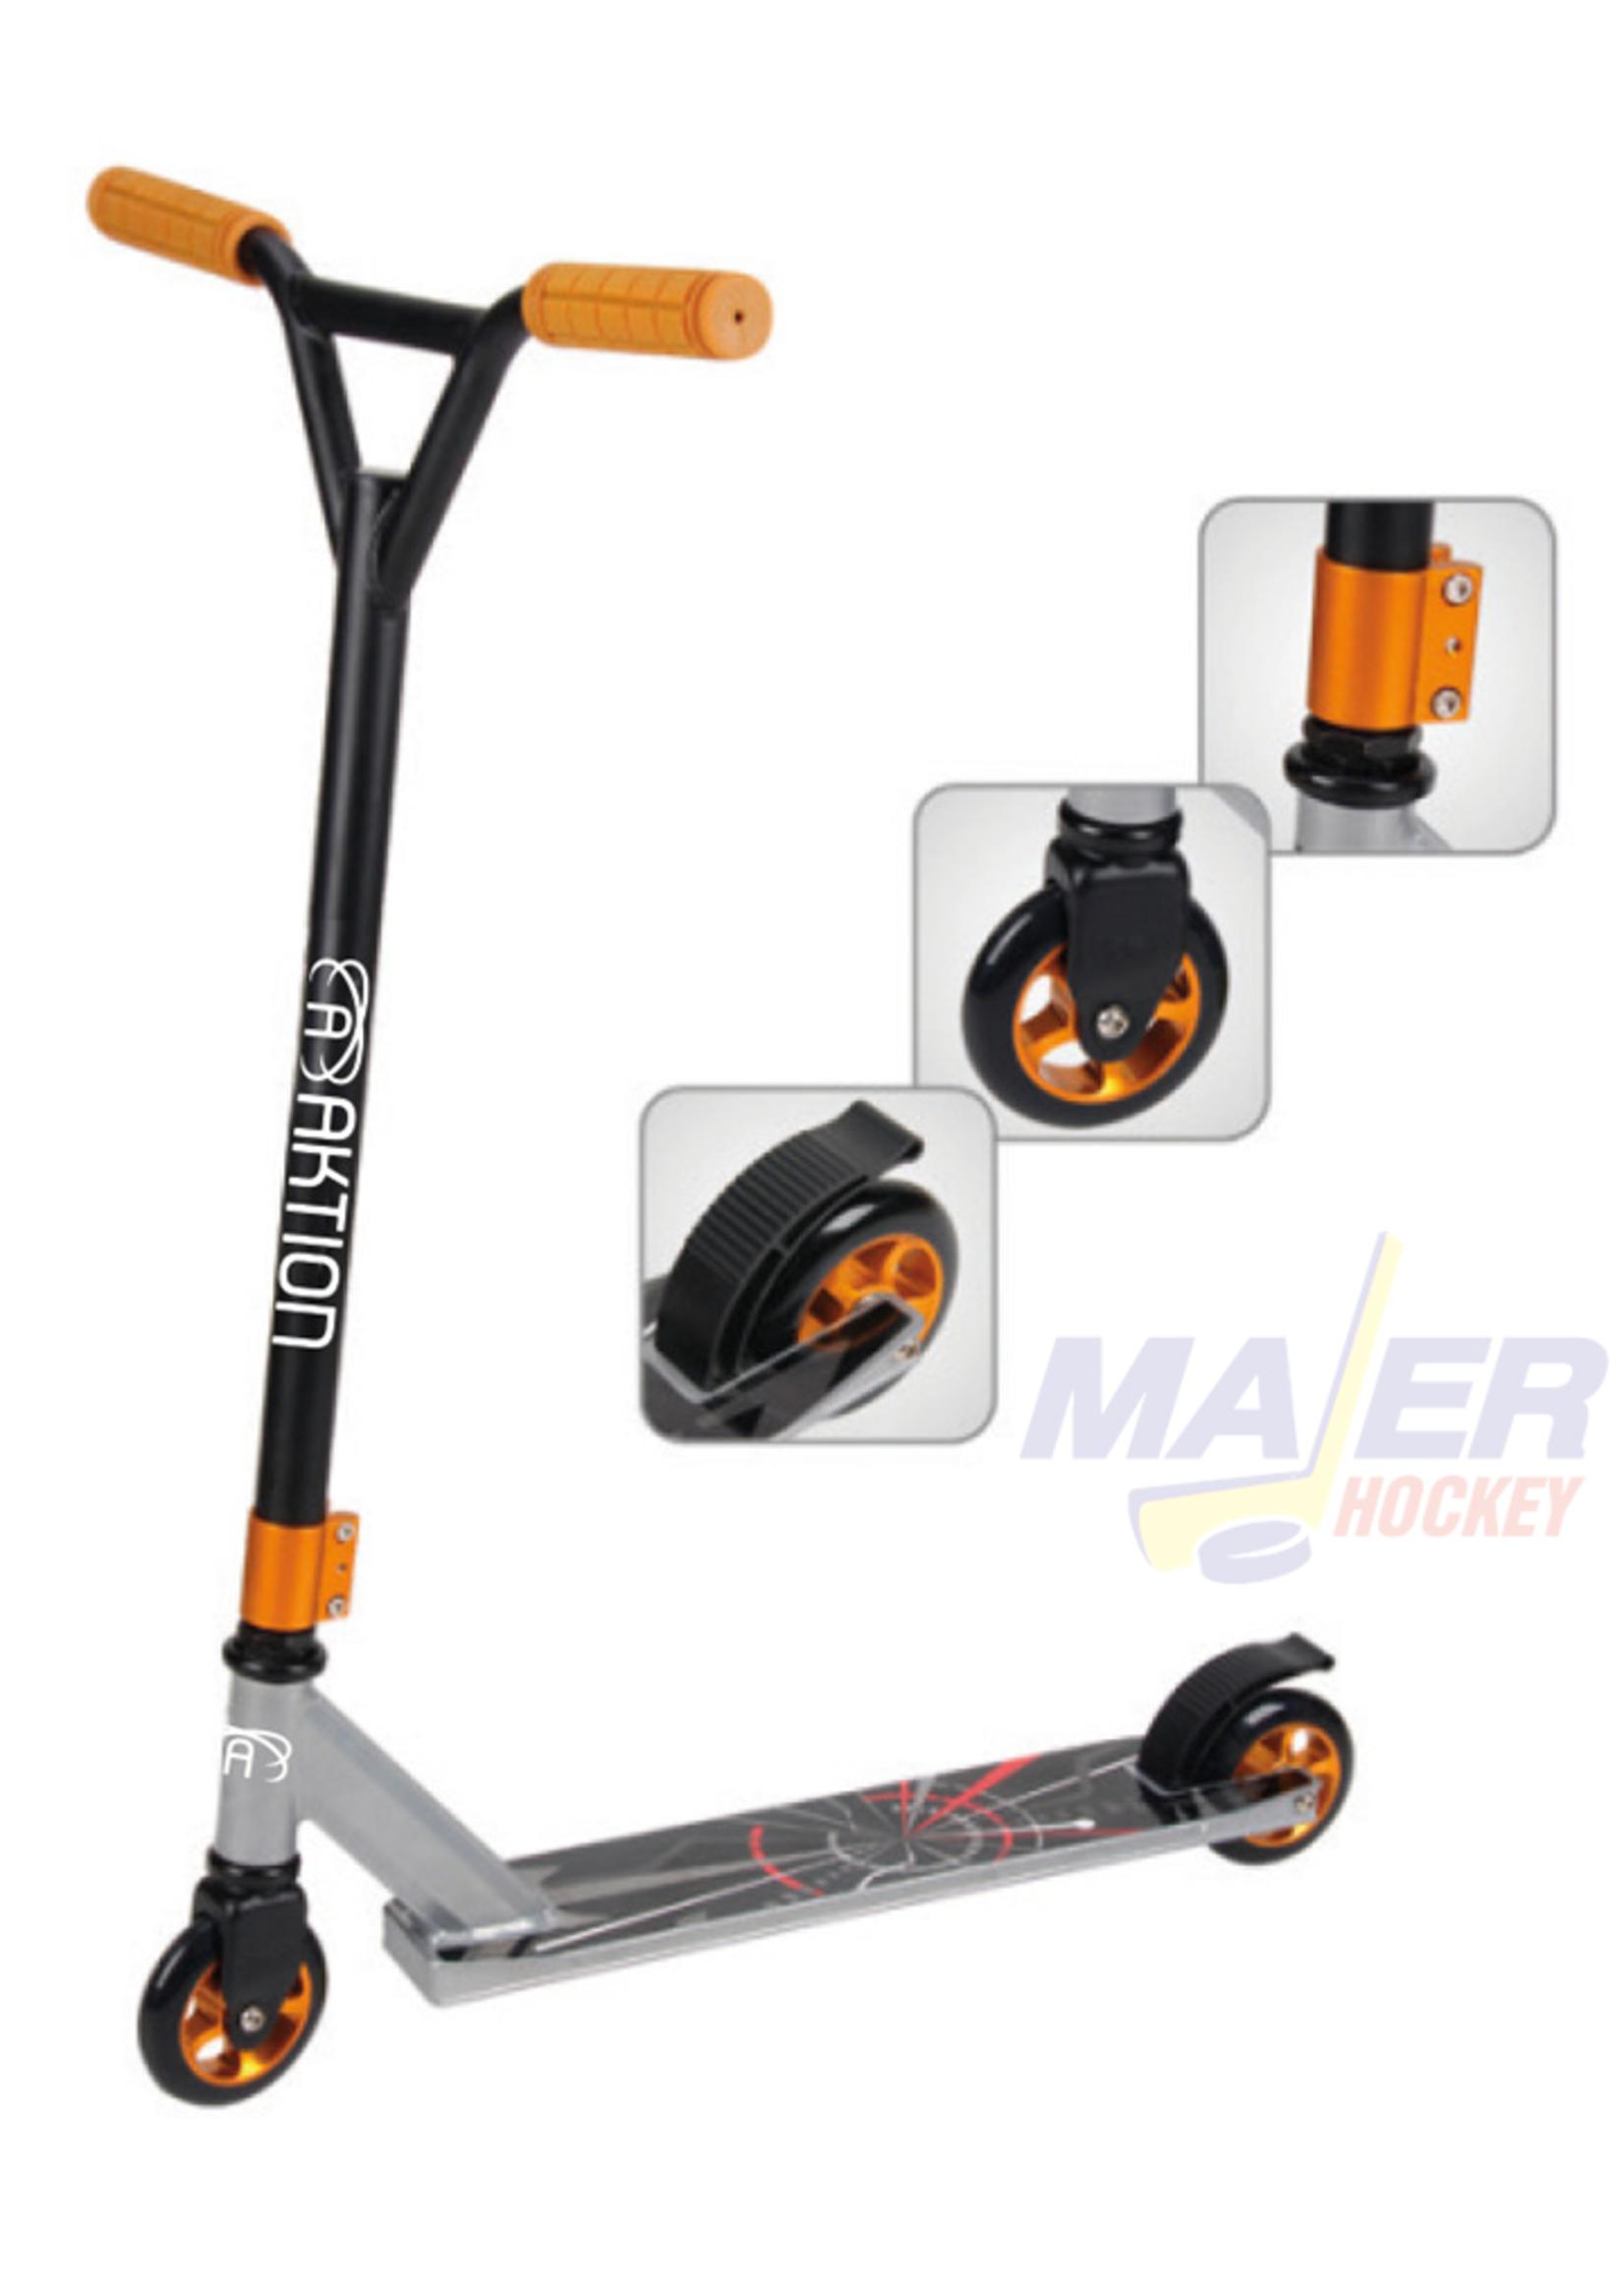 Aktion Pro Stunt Freestyle Scooter